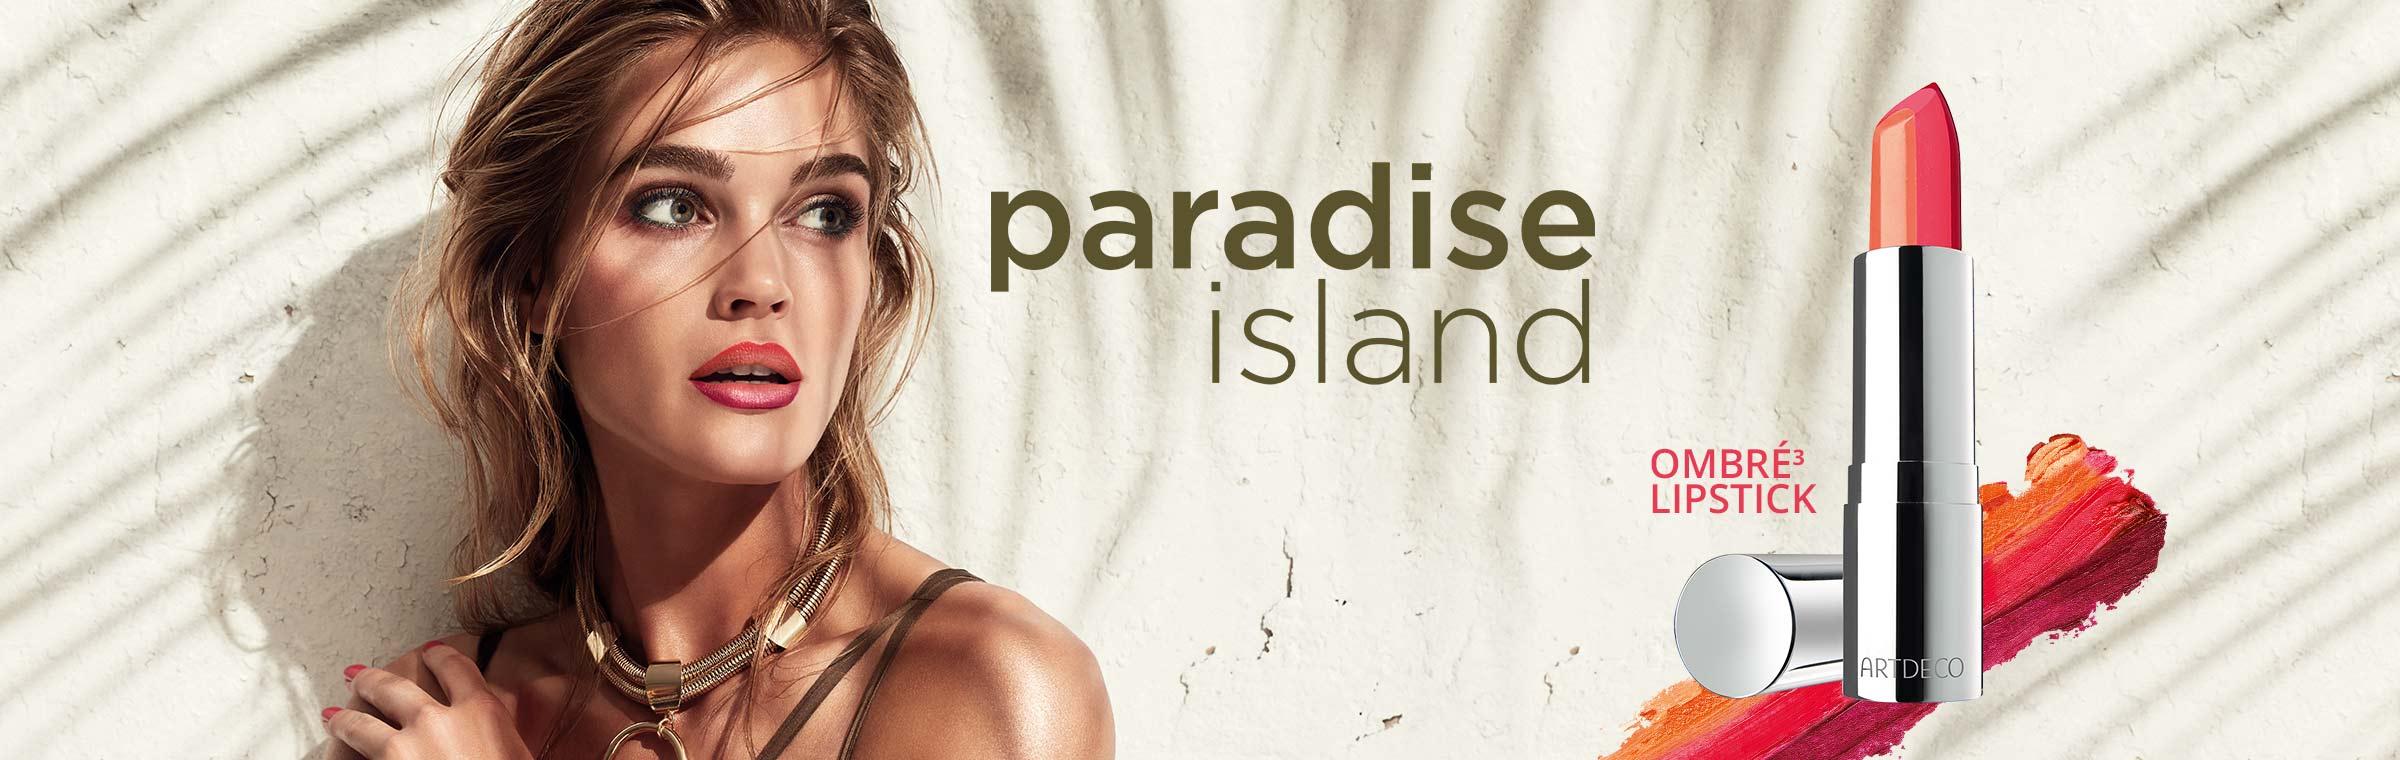 PARADISE ISLAND Лято 2017